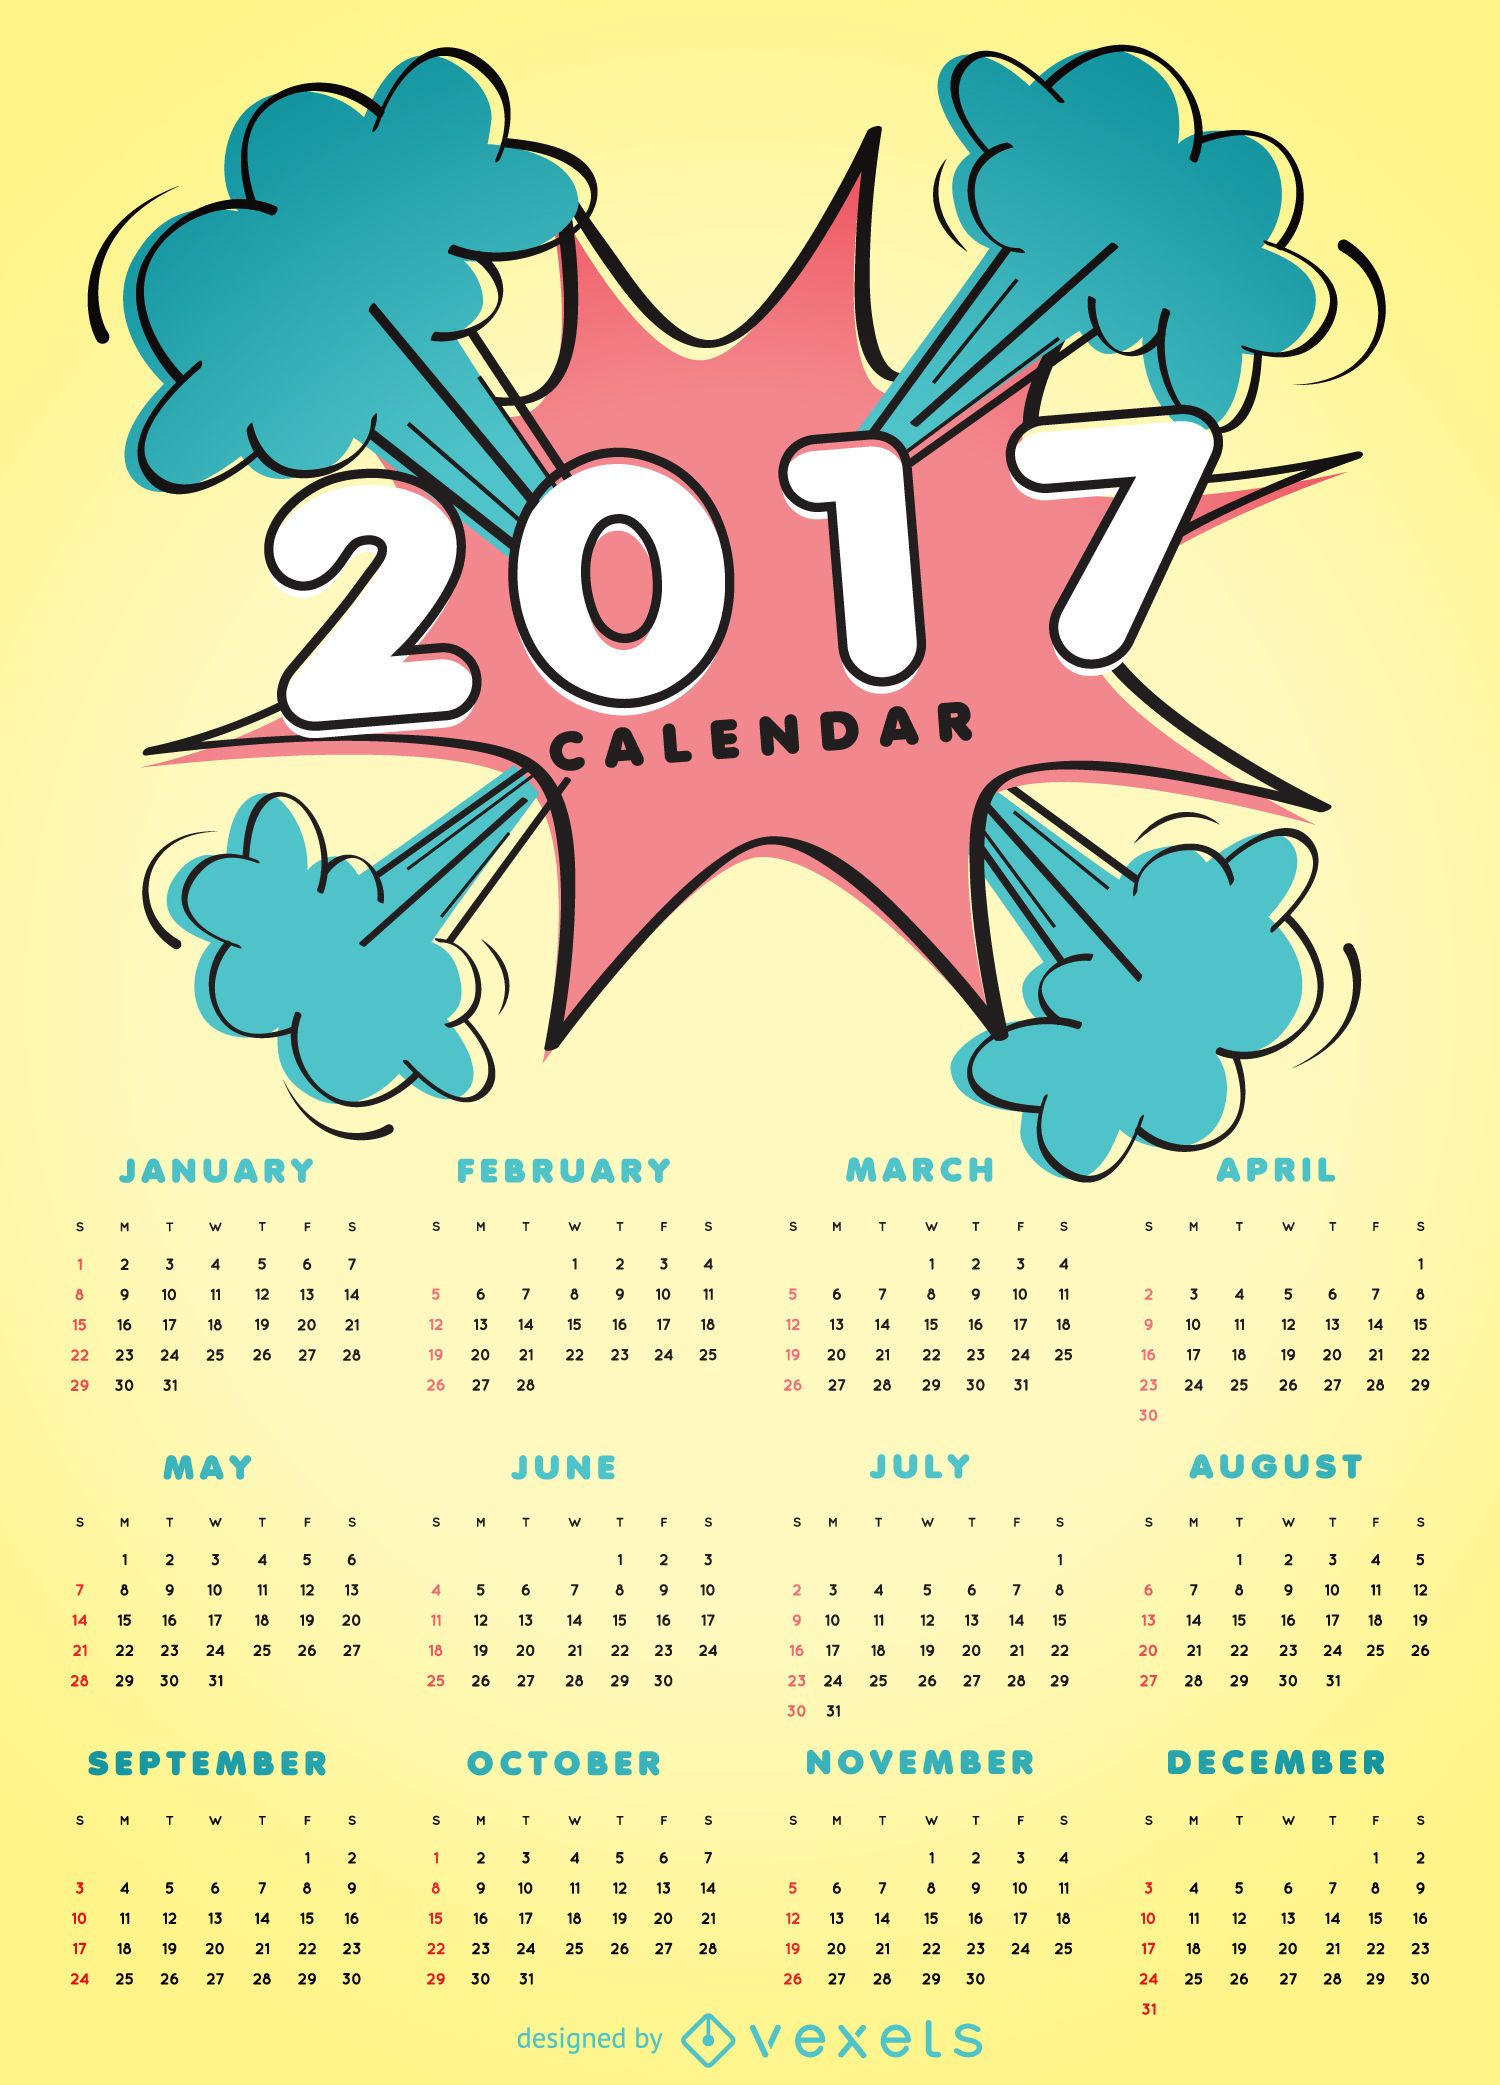 2017 comic style calendar